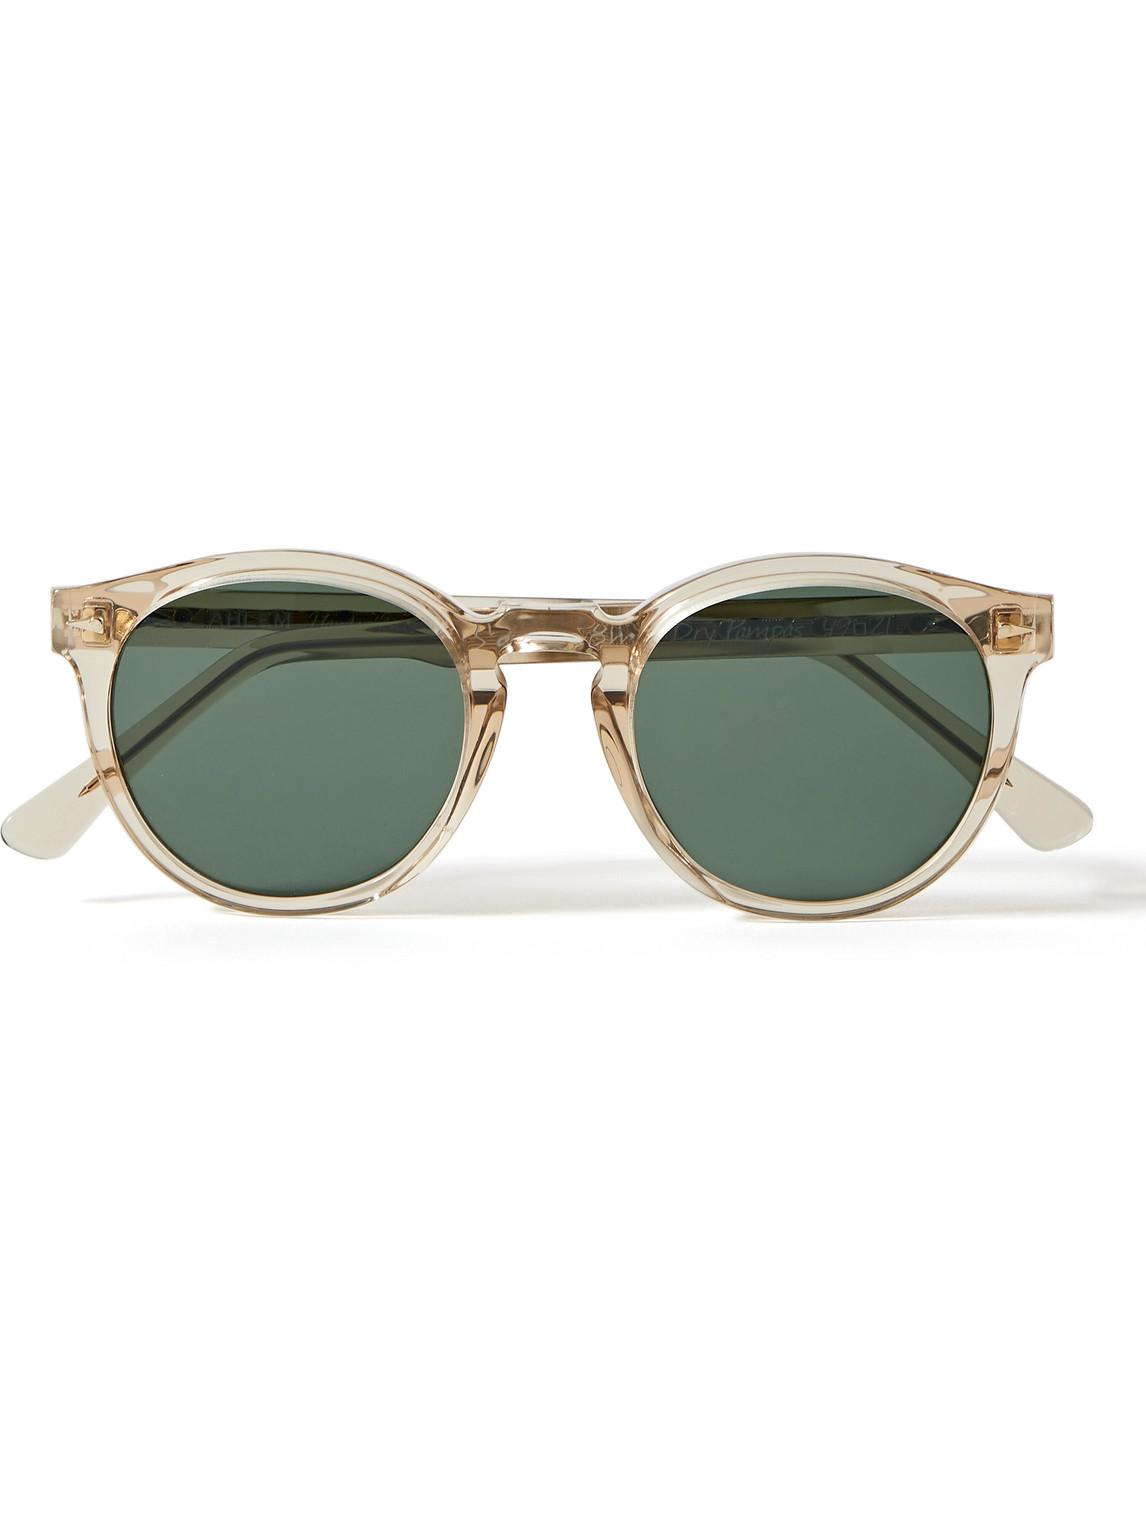 Ahlem St Germain Round-frame Acetate Sunglasses In Neutrals